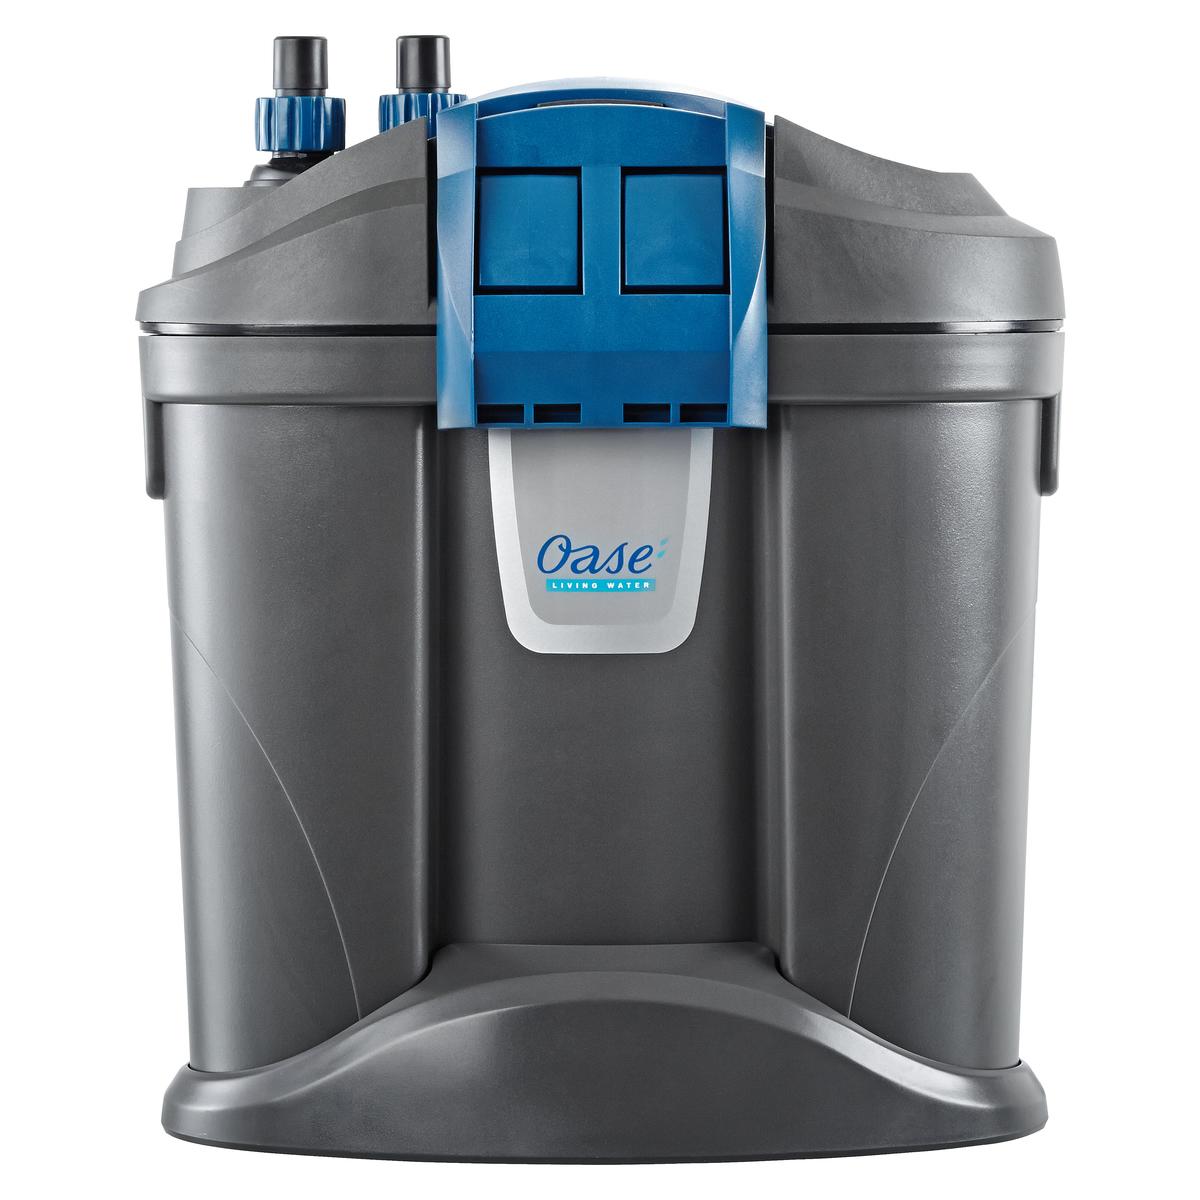 Oase FiltoSmart 200 Mini / Nano Canister filter 17W 800 L/H